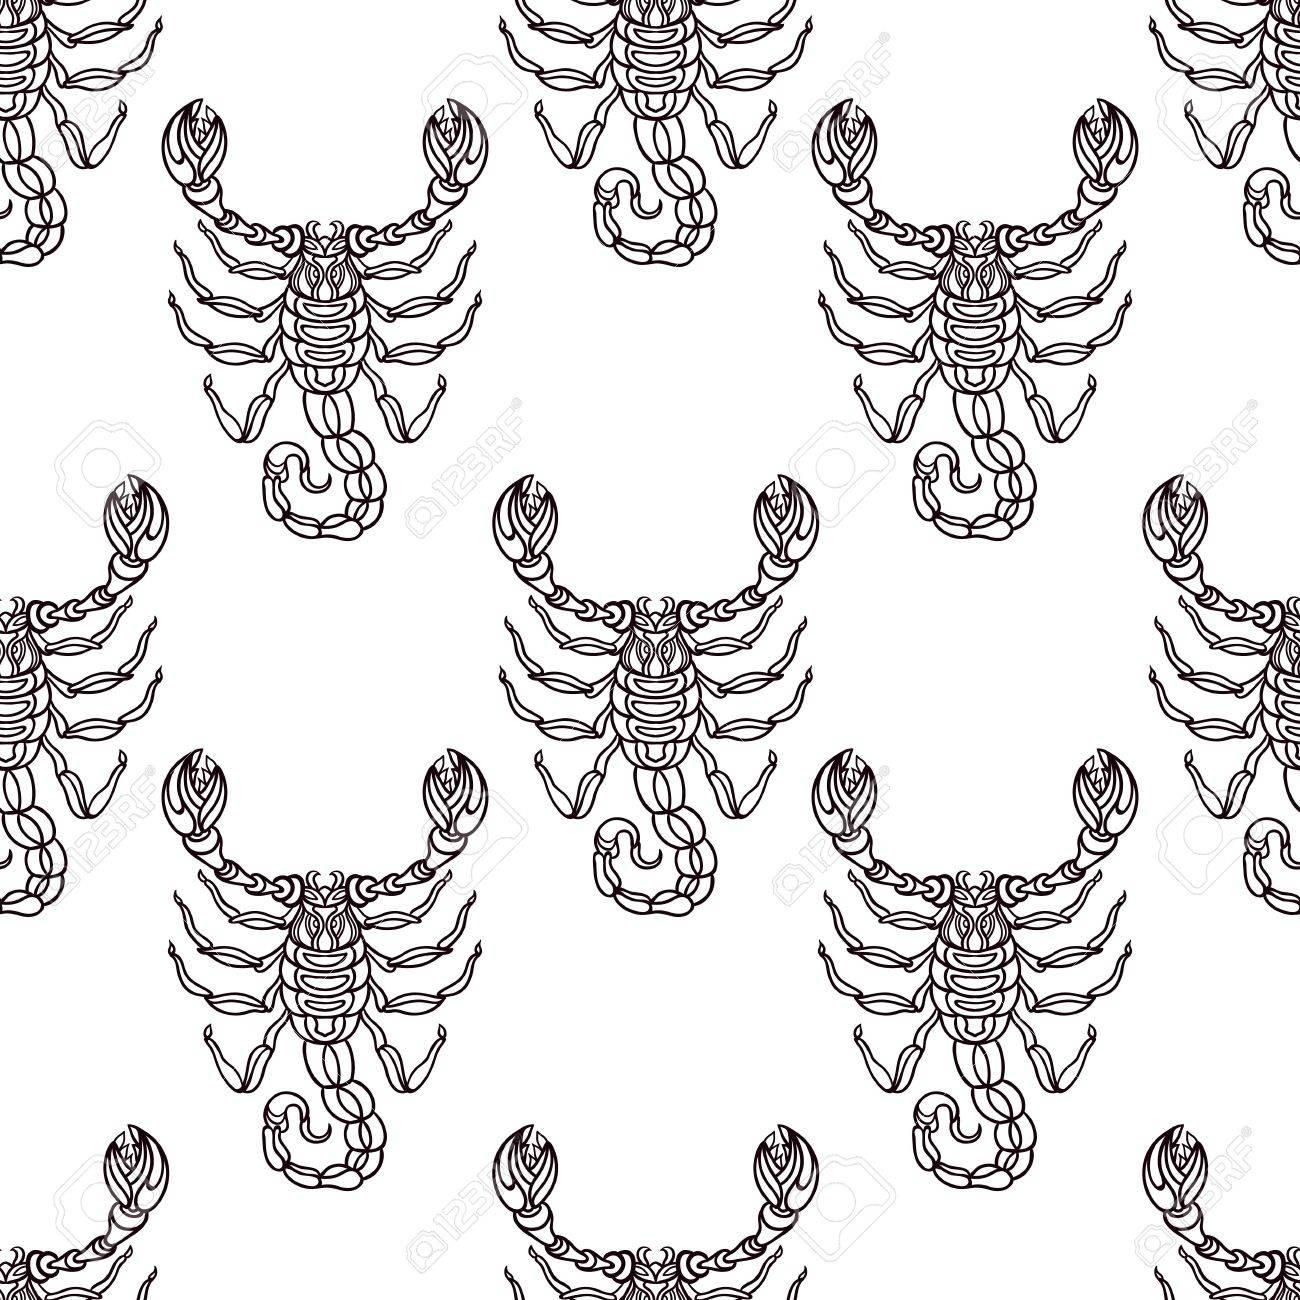 Free Aztecs Coloring Pages, Download Free Clip Art, Free Clip Art ...   1300x1300